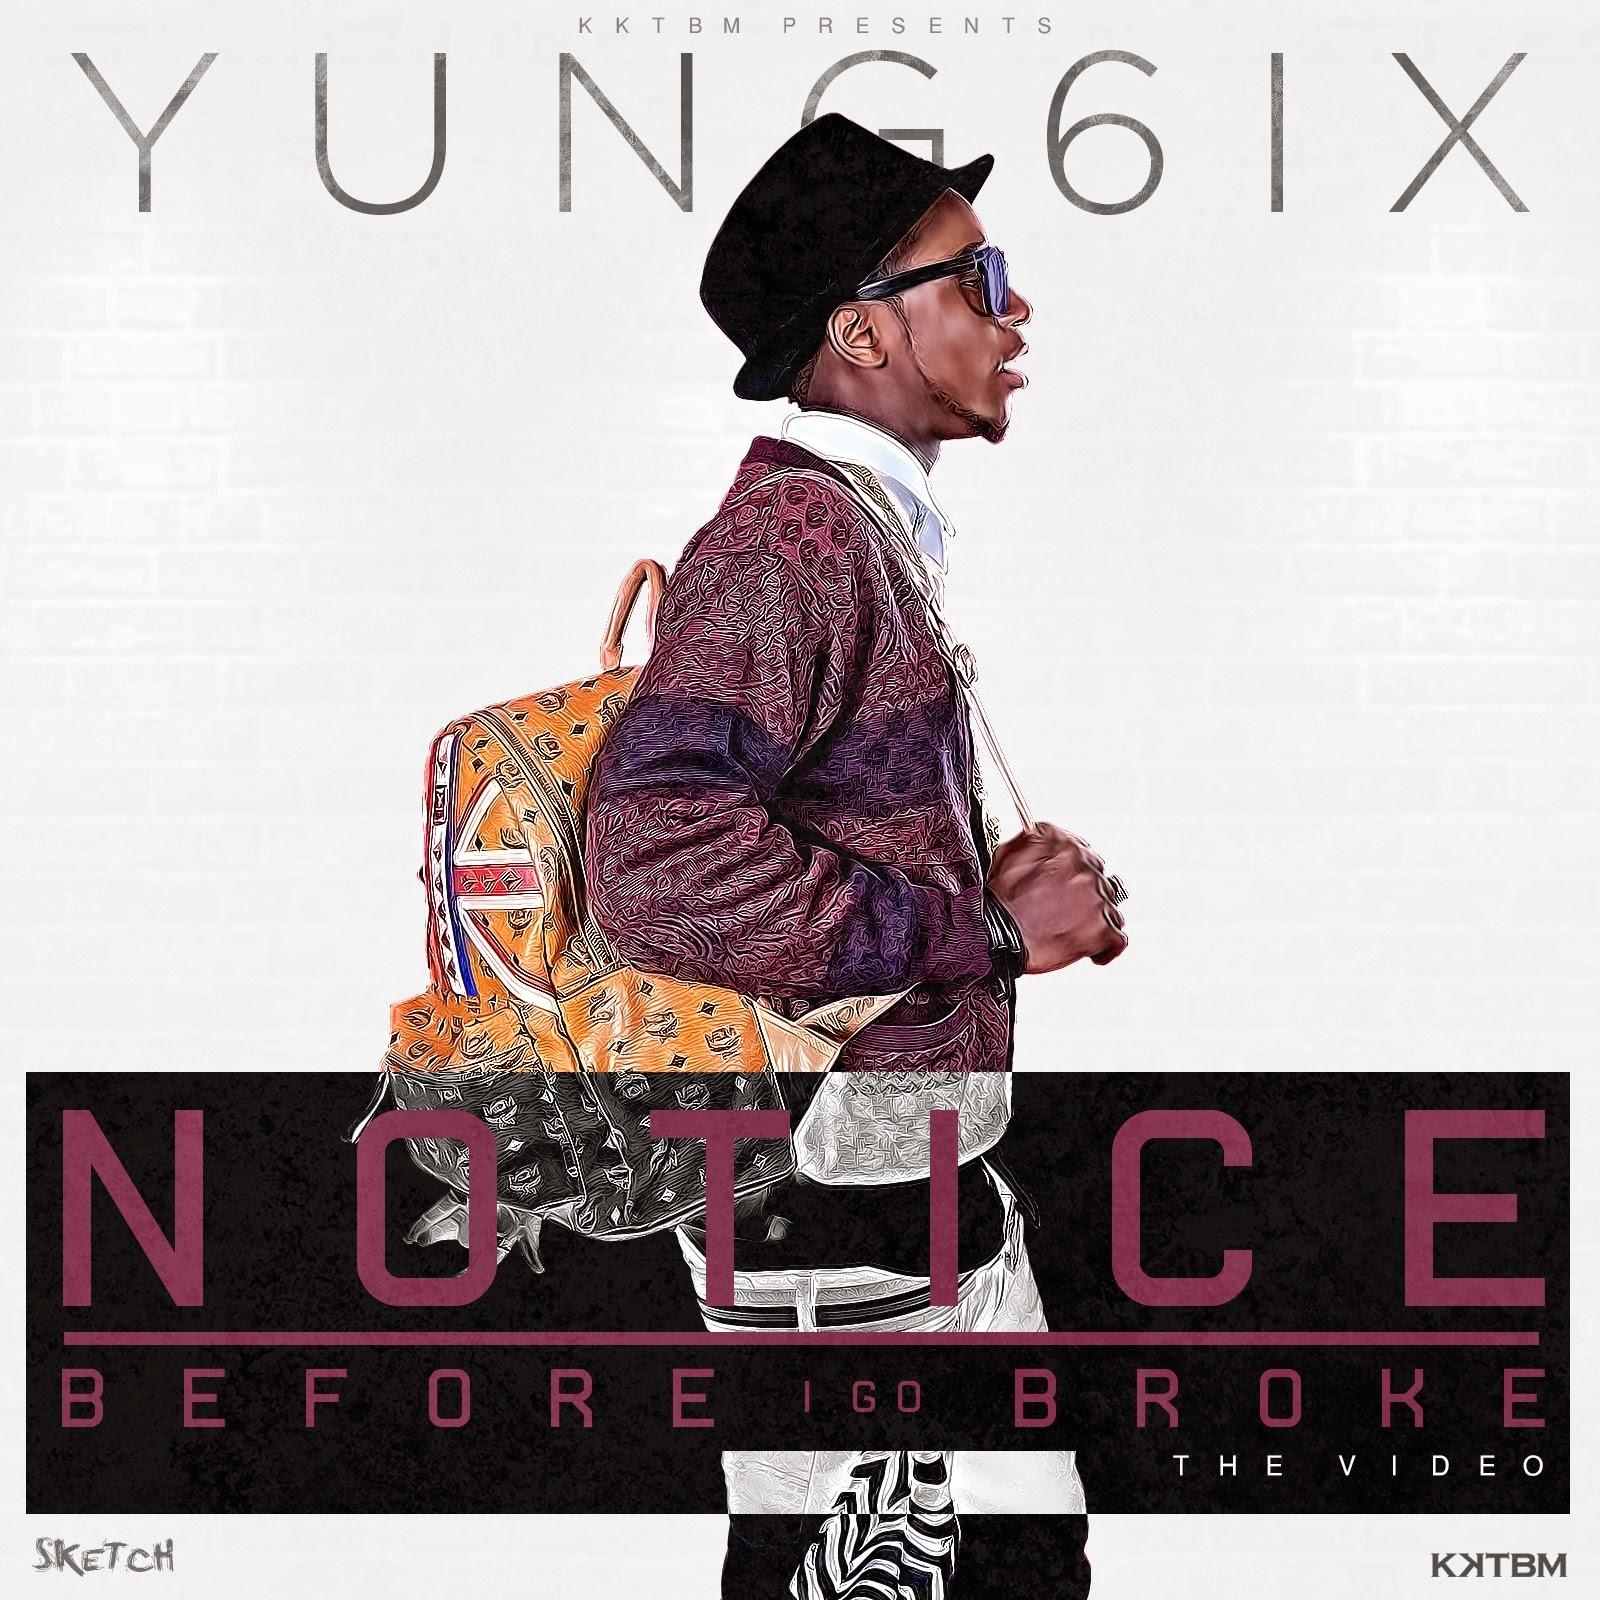 VIDEO + AUDIO : Yung6ix - Notice - Before I Go Broke